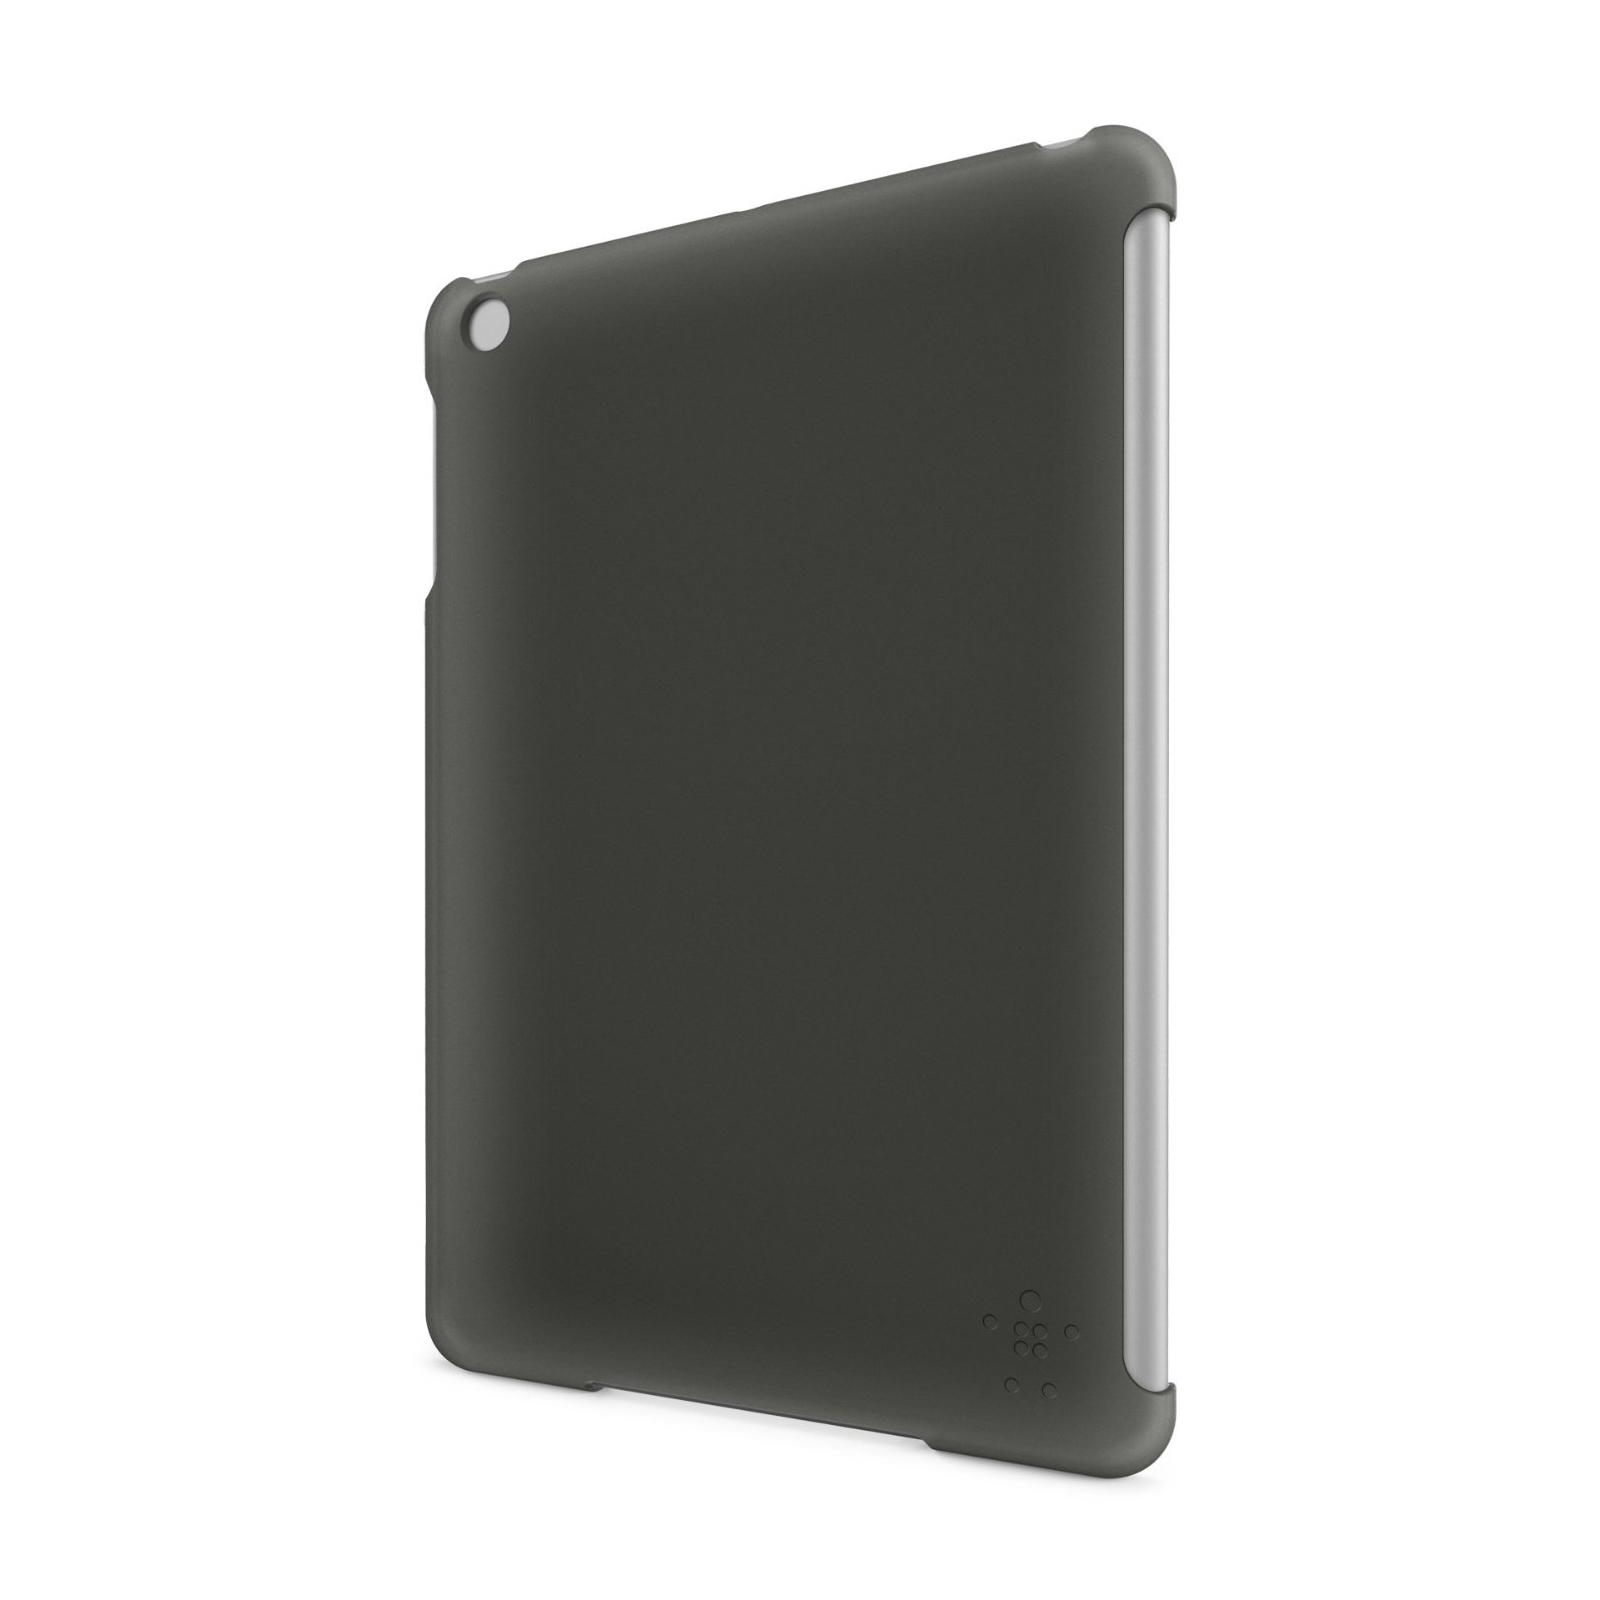 Чехол для планшета Belkin iPad Air Snap Shield /Smoke (F7N083B2C00) изображение 2